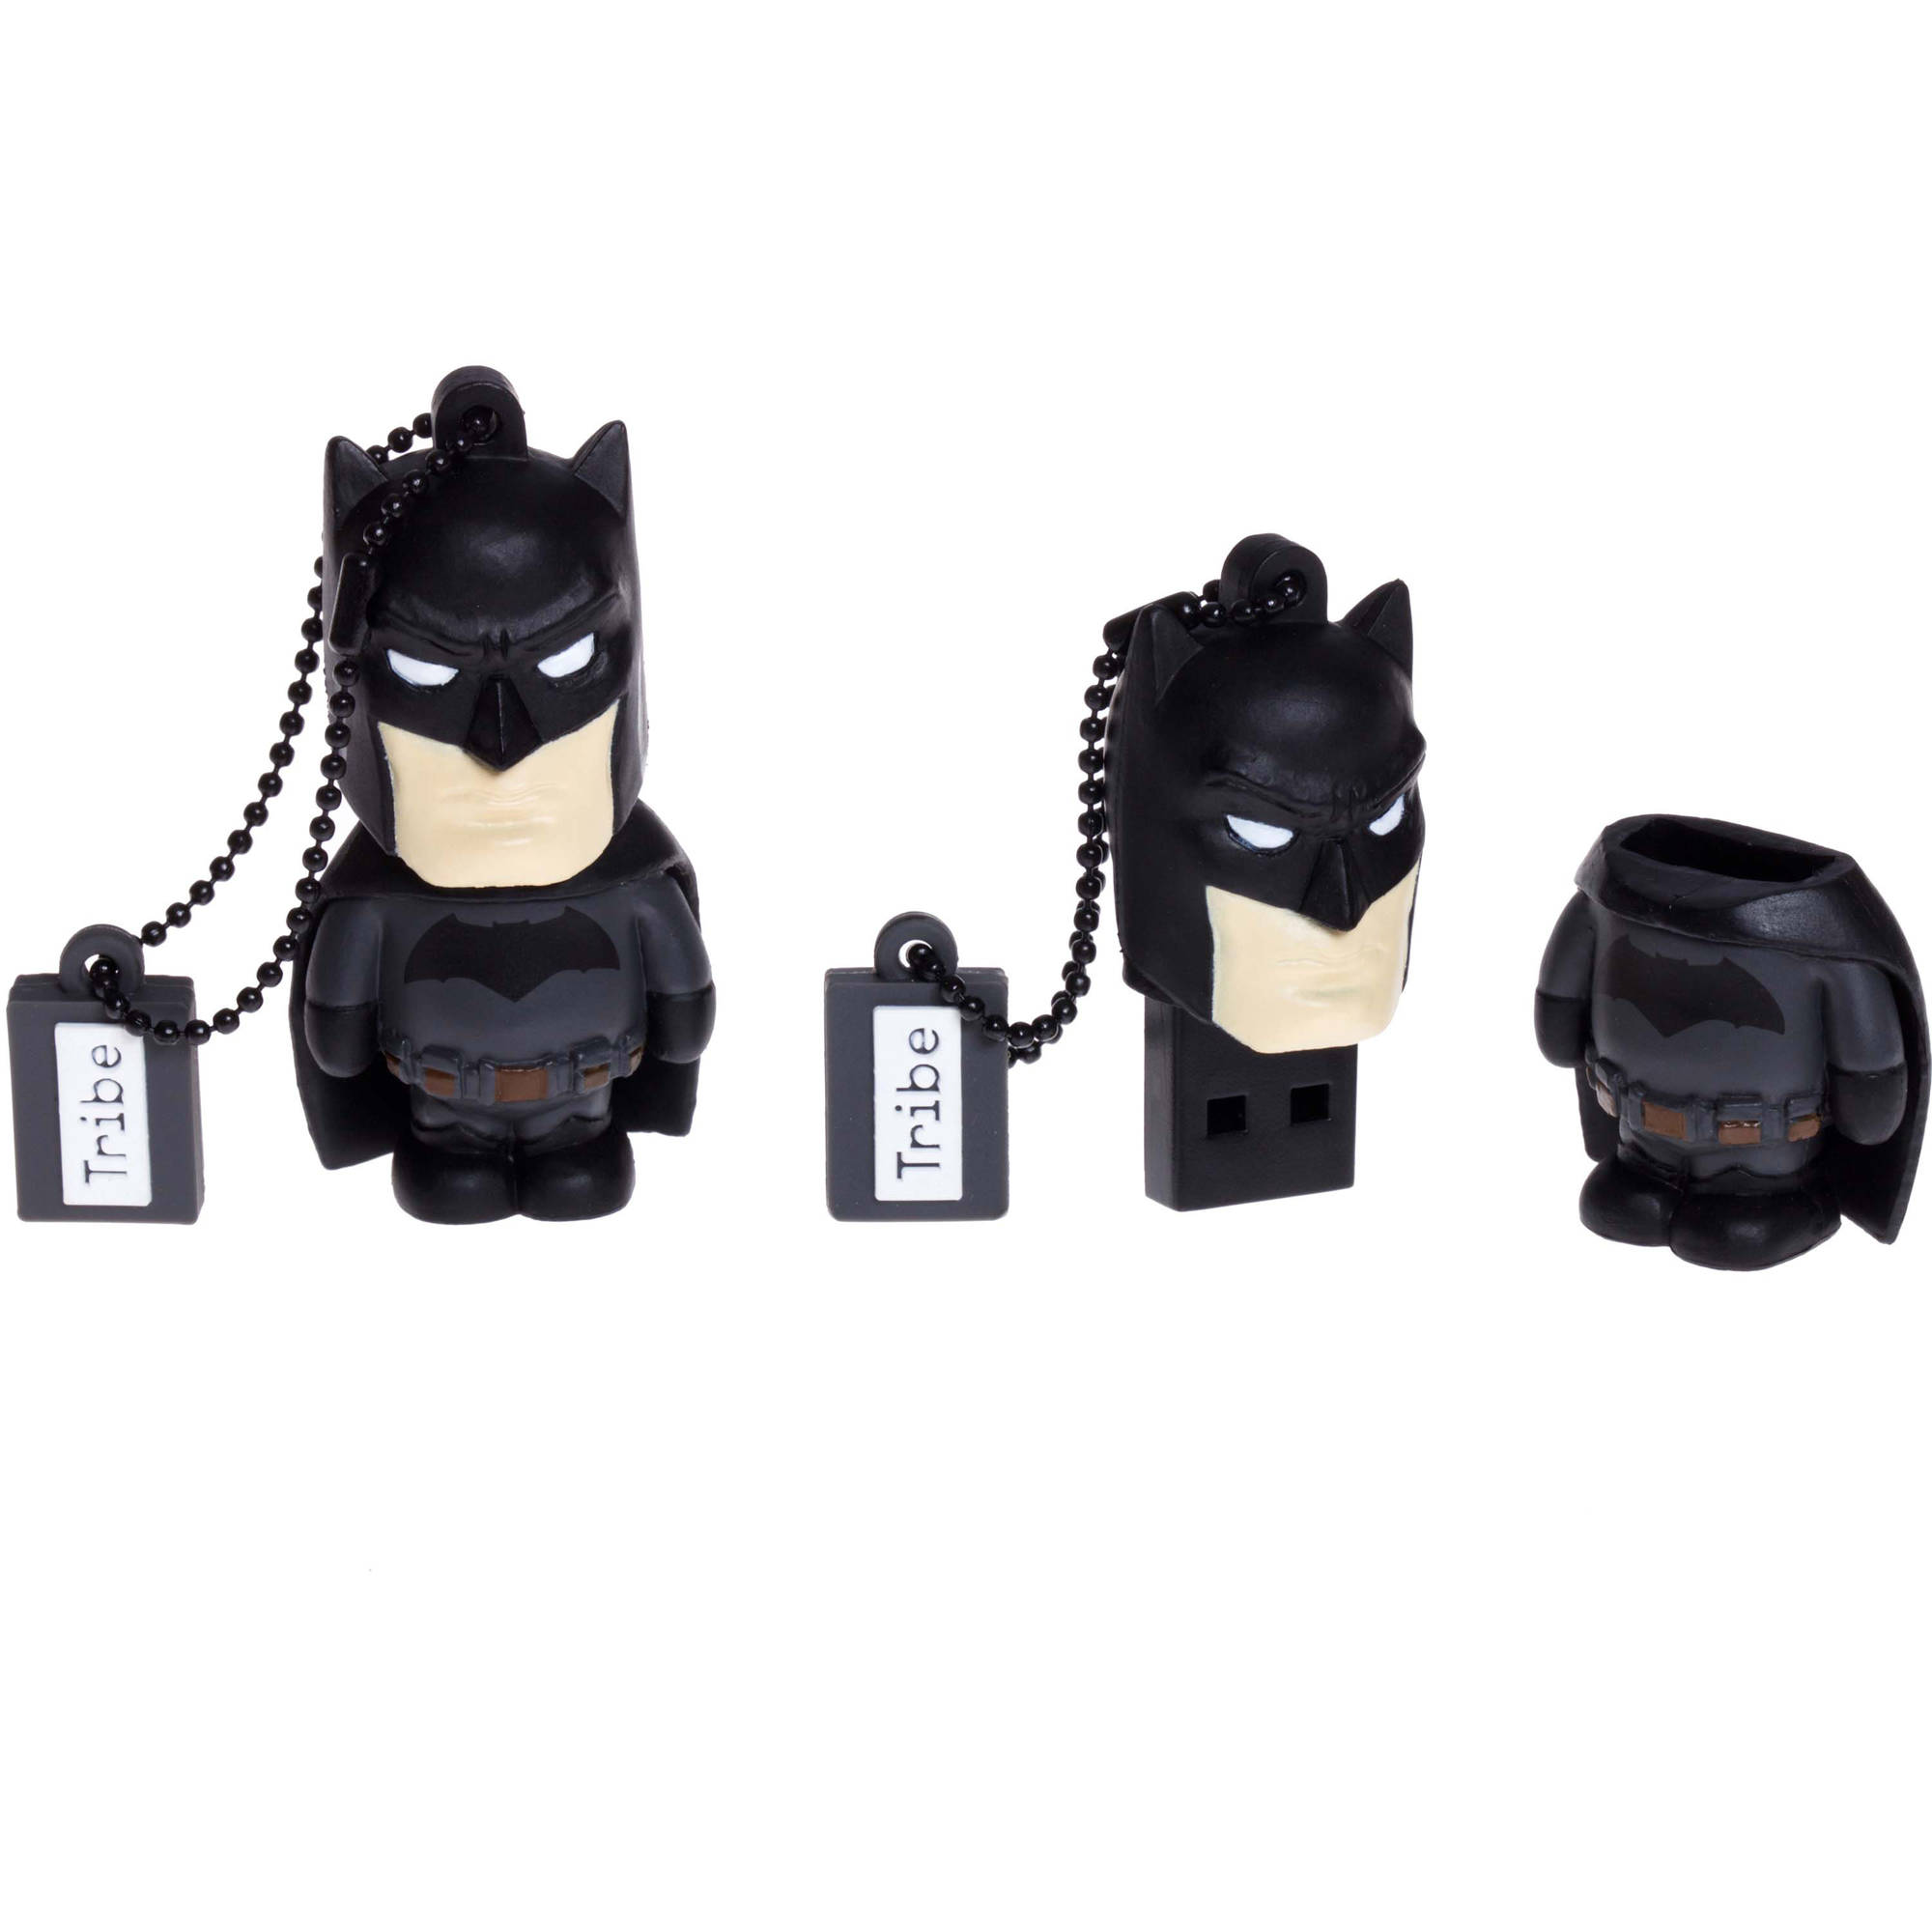 "Tribe USB Flash Drive 16GB DC ""Batman v Superman"" Batman Collectible Figure"